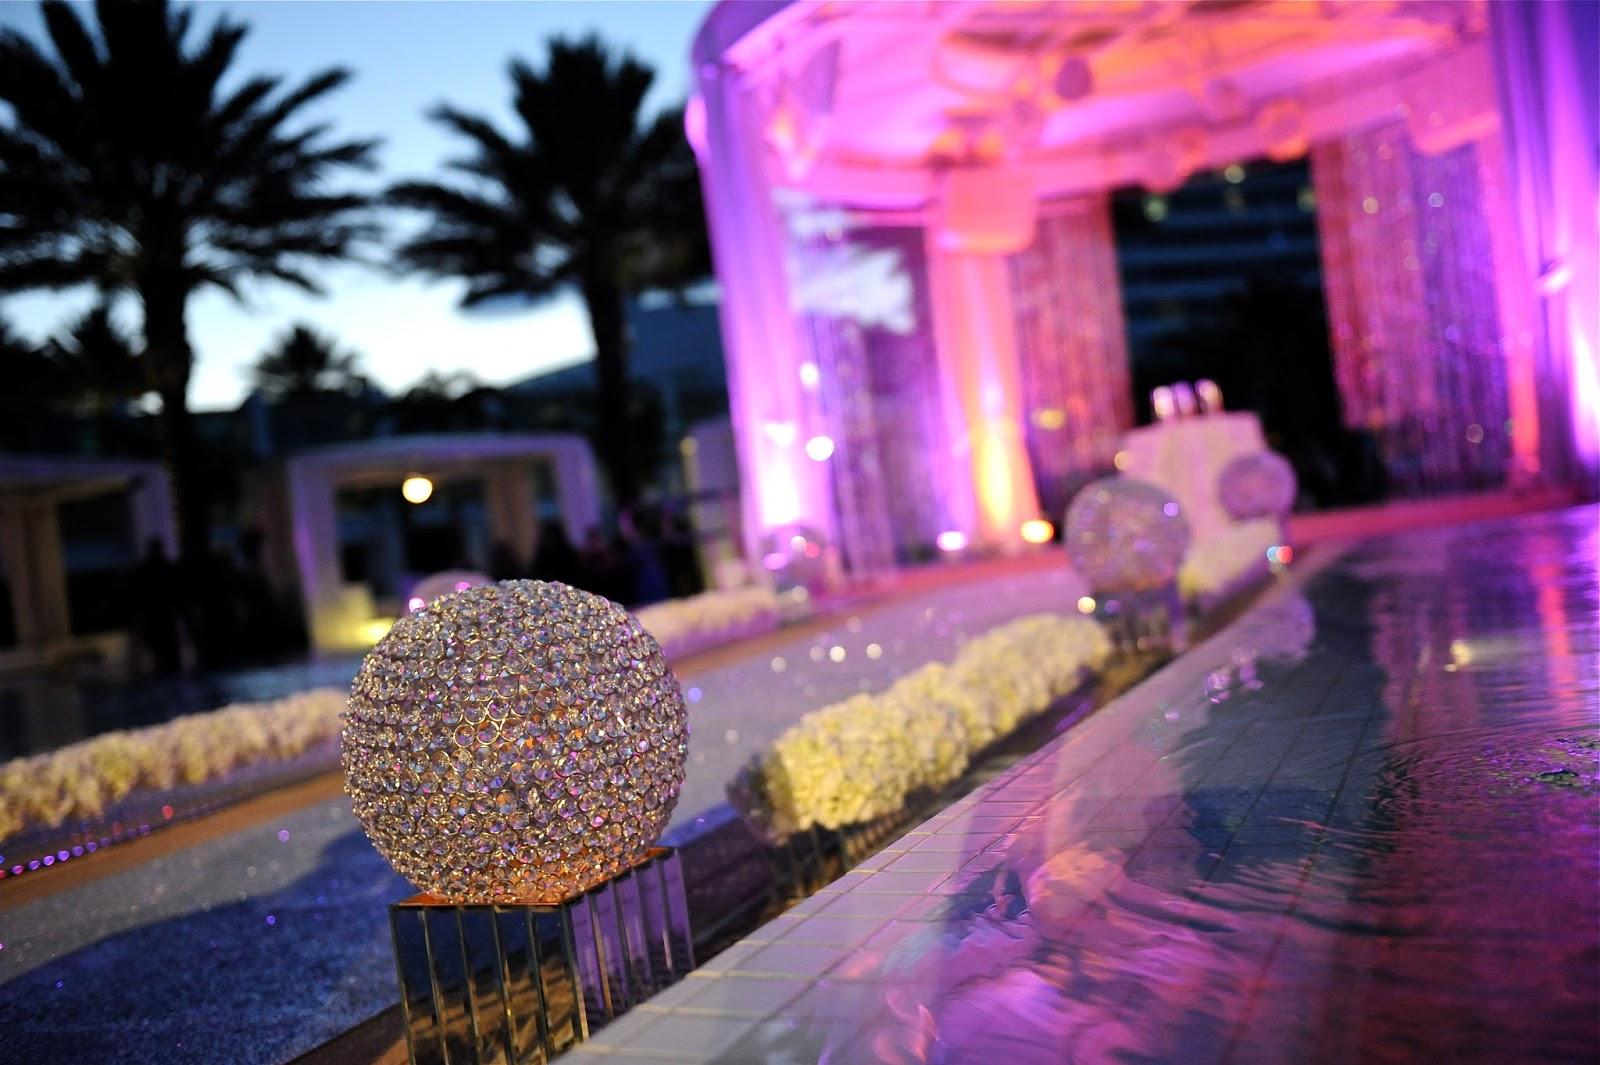 ceremony-aisle-decor-ideas-wedding-bling-dream-design- & Dream Design Weddings by Tiffany Cook : Ceremony Aisle Decor by ...